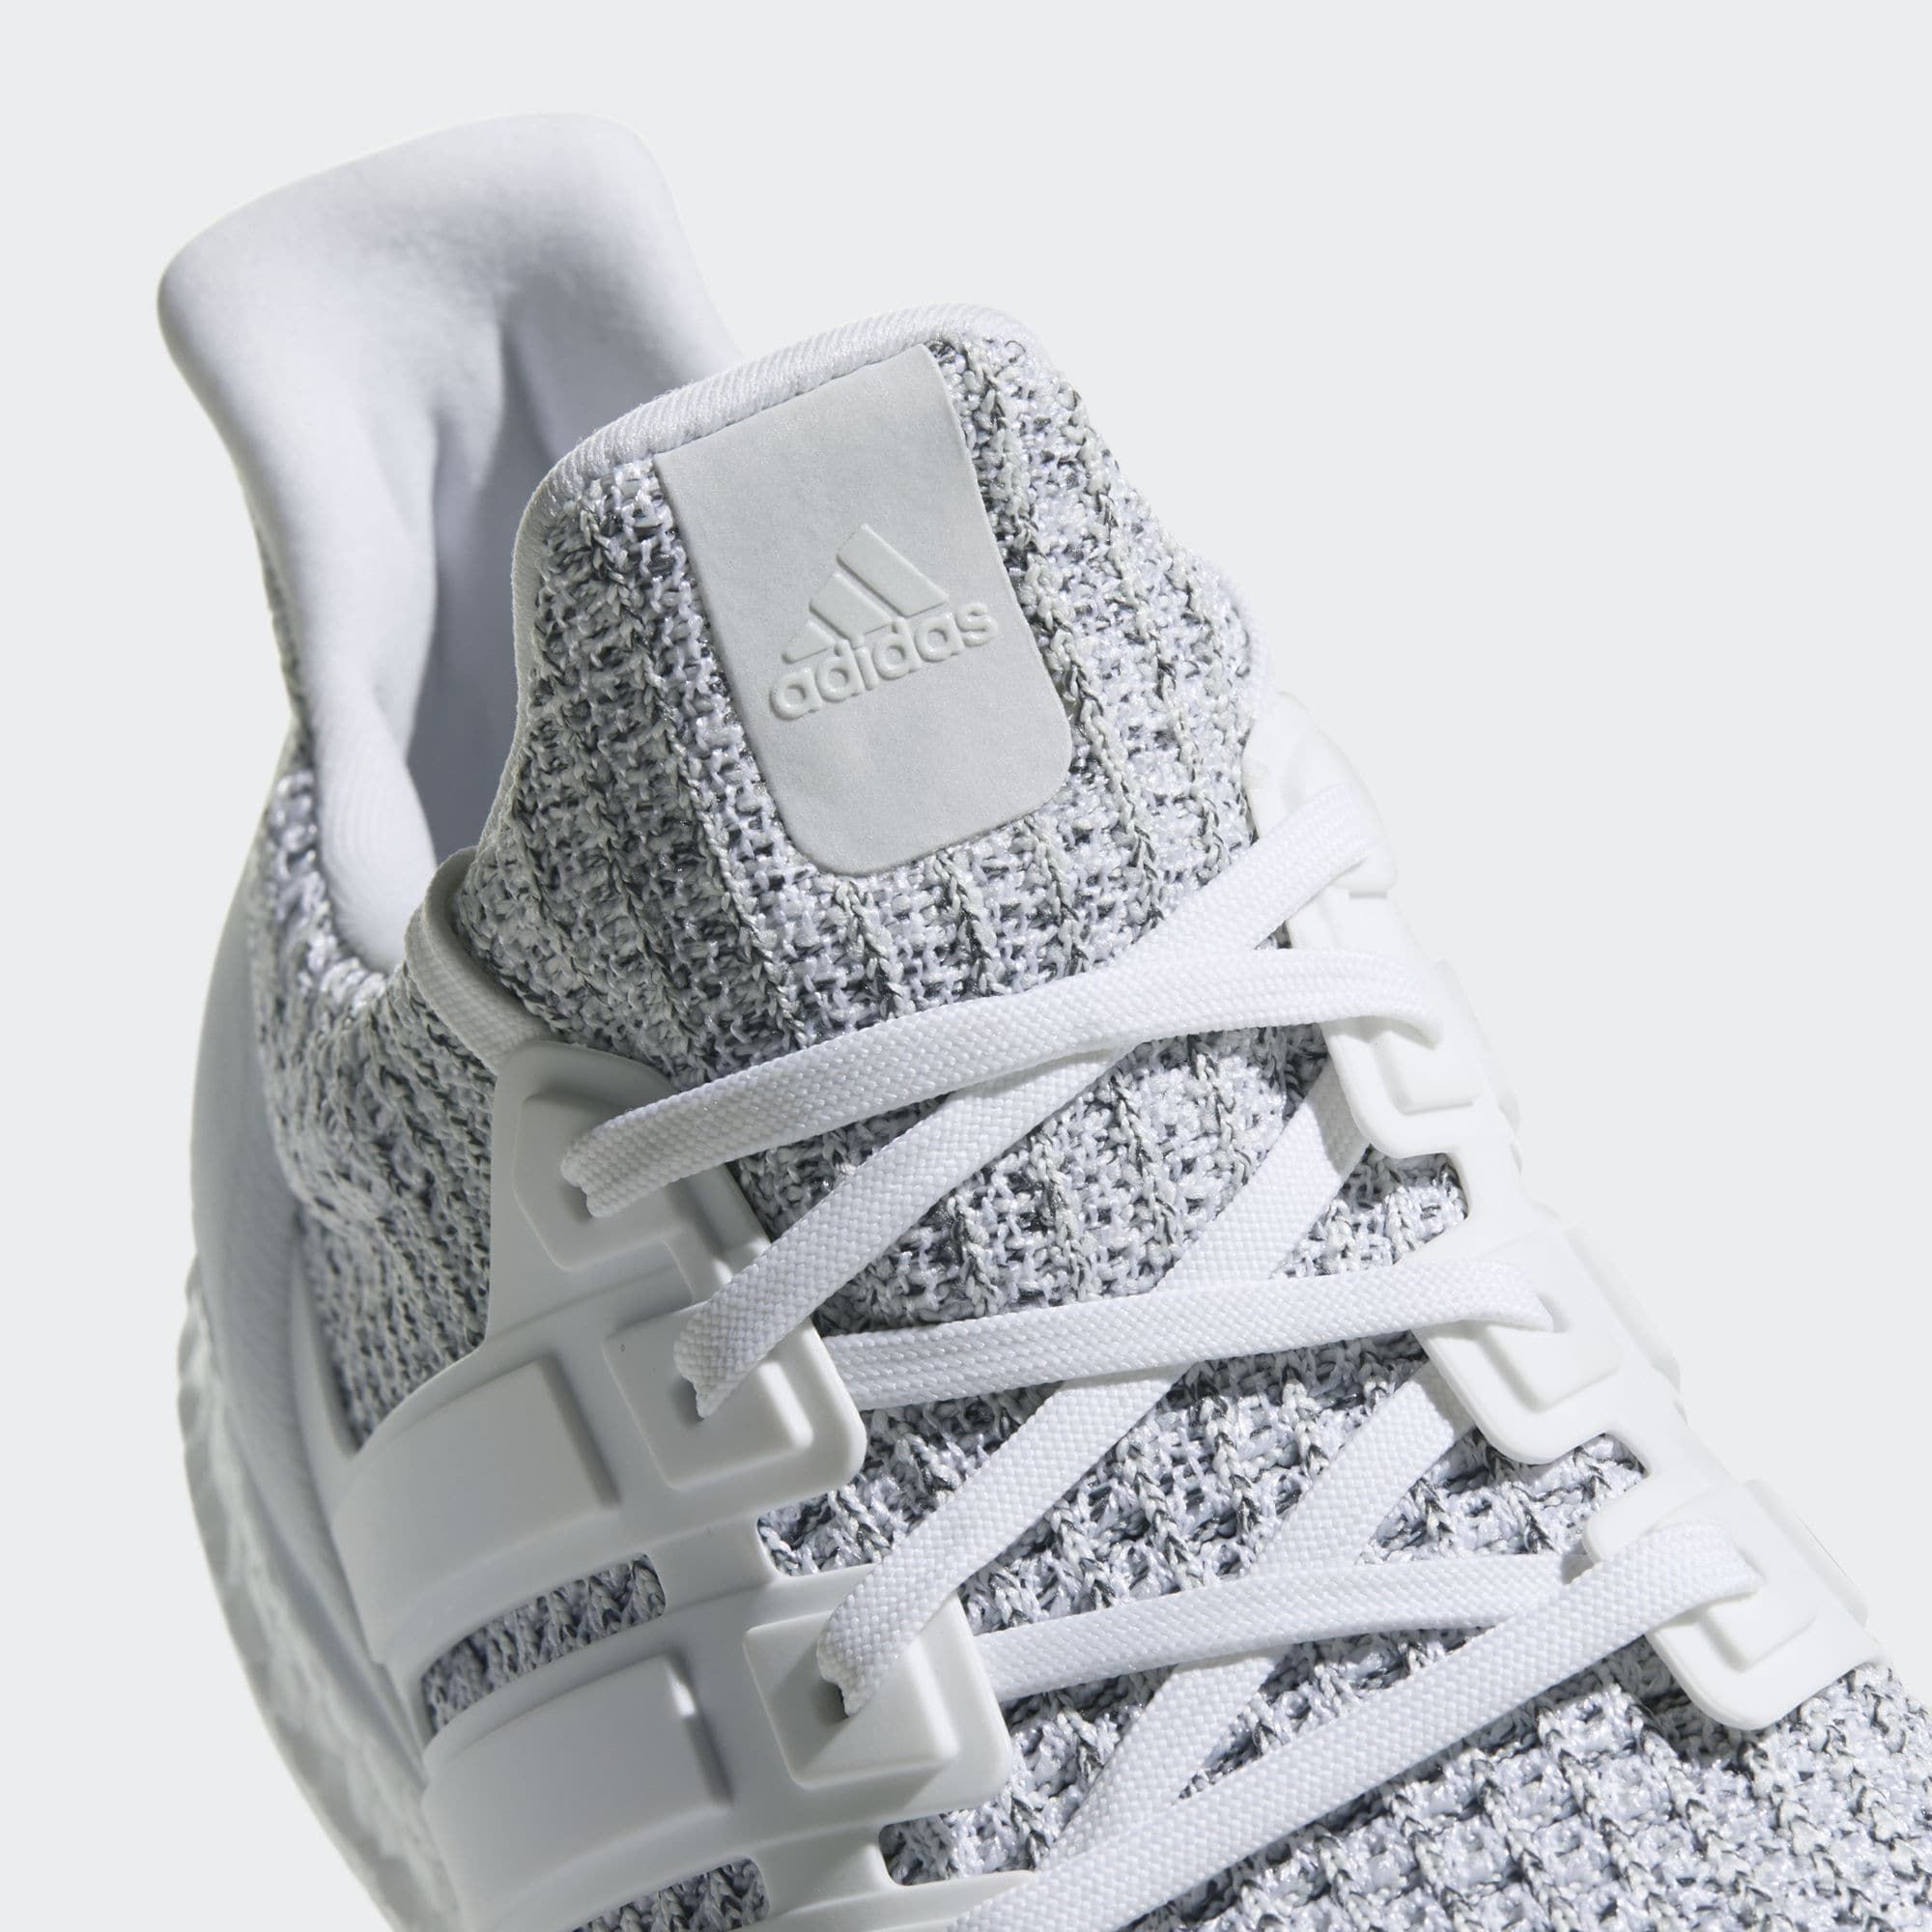 ADIDAS PERFORMANCE Sneaker 'UltraBOOST Uncaged' Damen ...